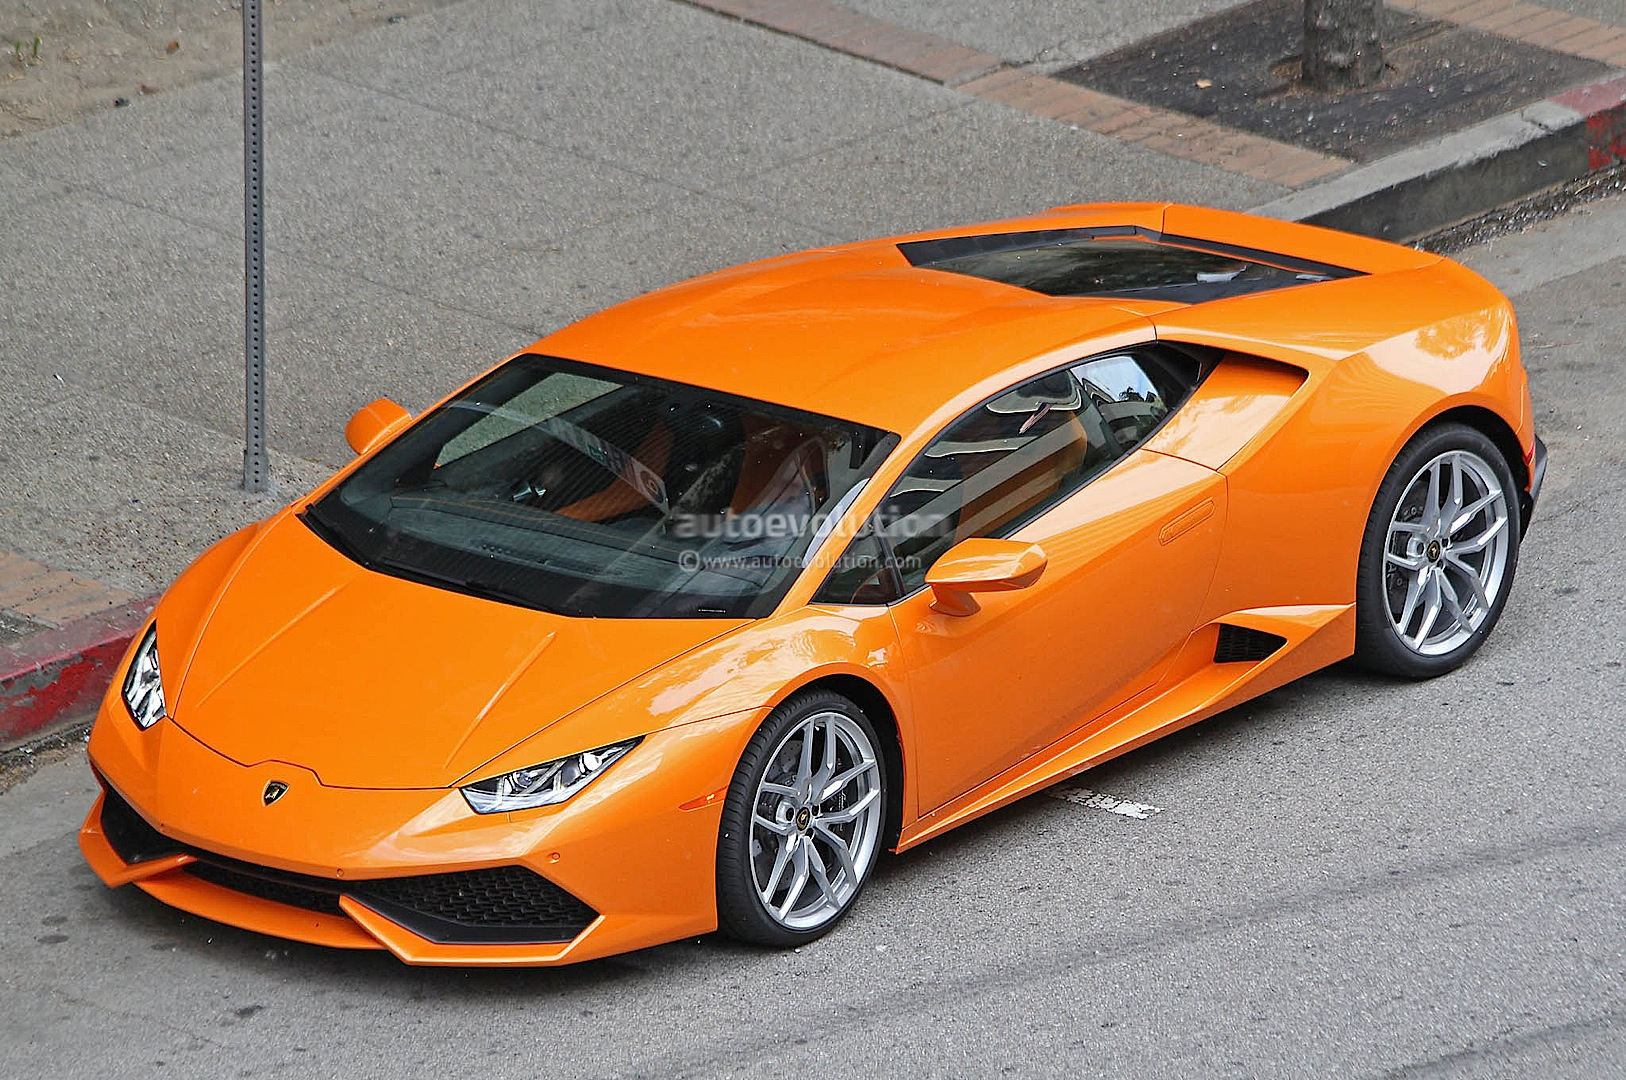 spyshots-orange-lamborghini-huracan-street-racing-in-the-us_1.jpg?1390936746